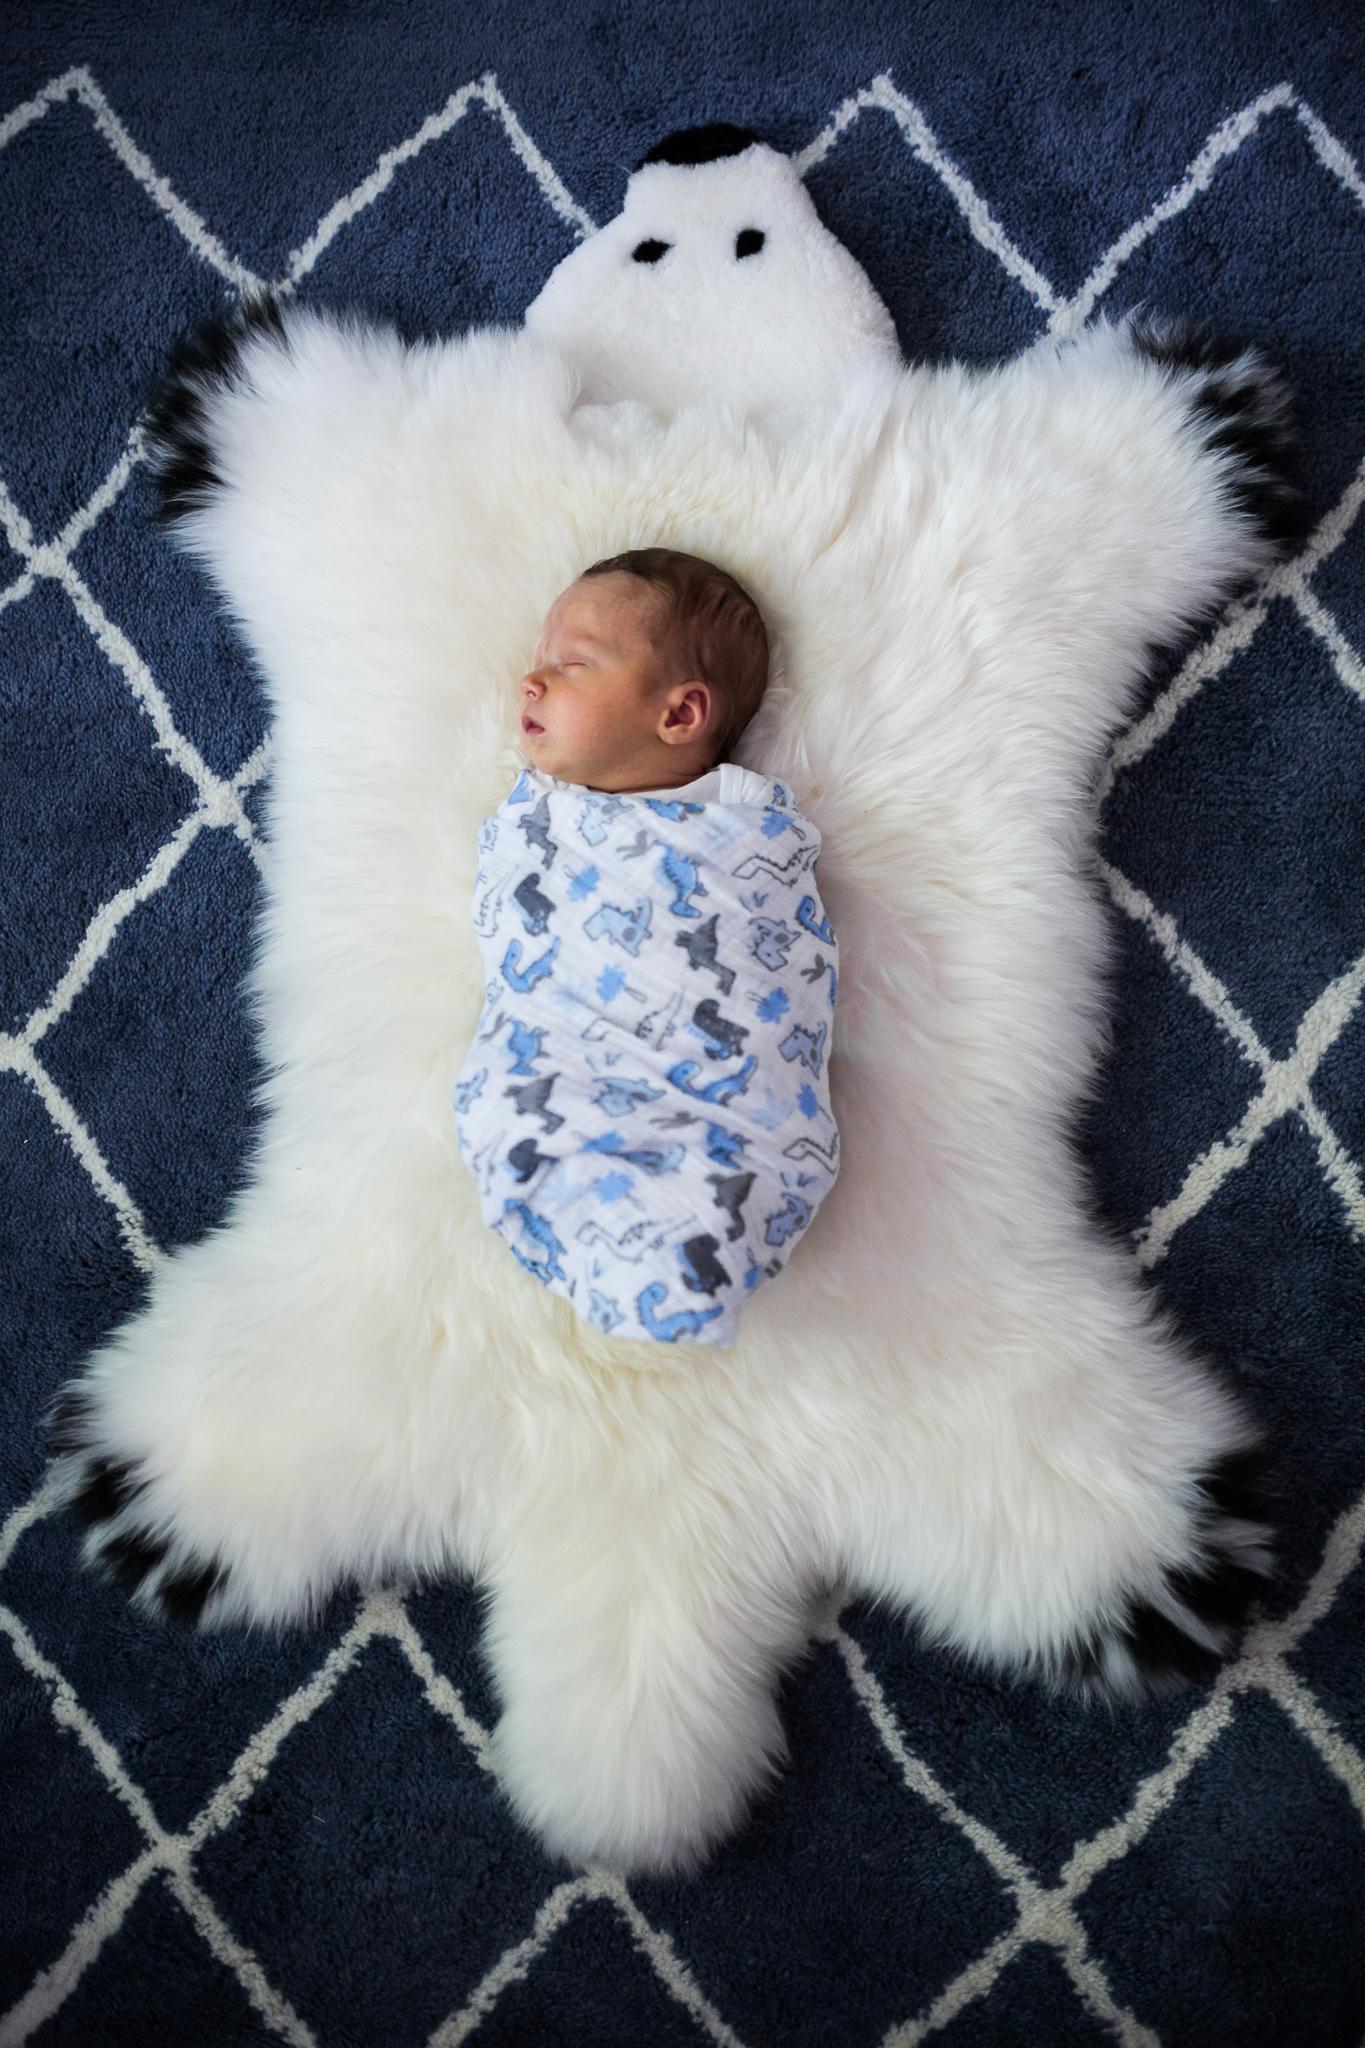 Swaddled baby lays on bear blanket from Huntsville and Madison Alabama lifestyle newborn photographer Rachel K Photo